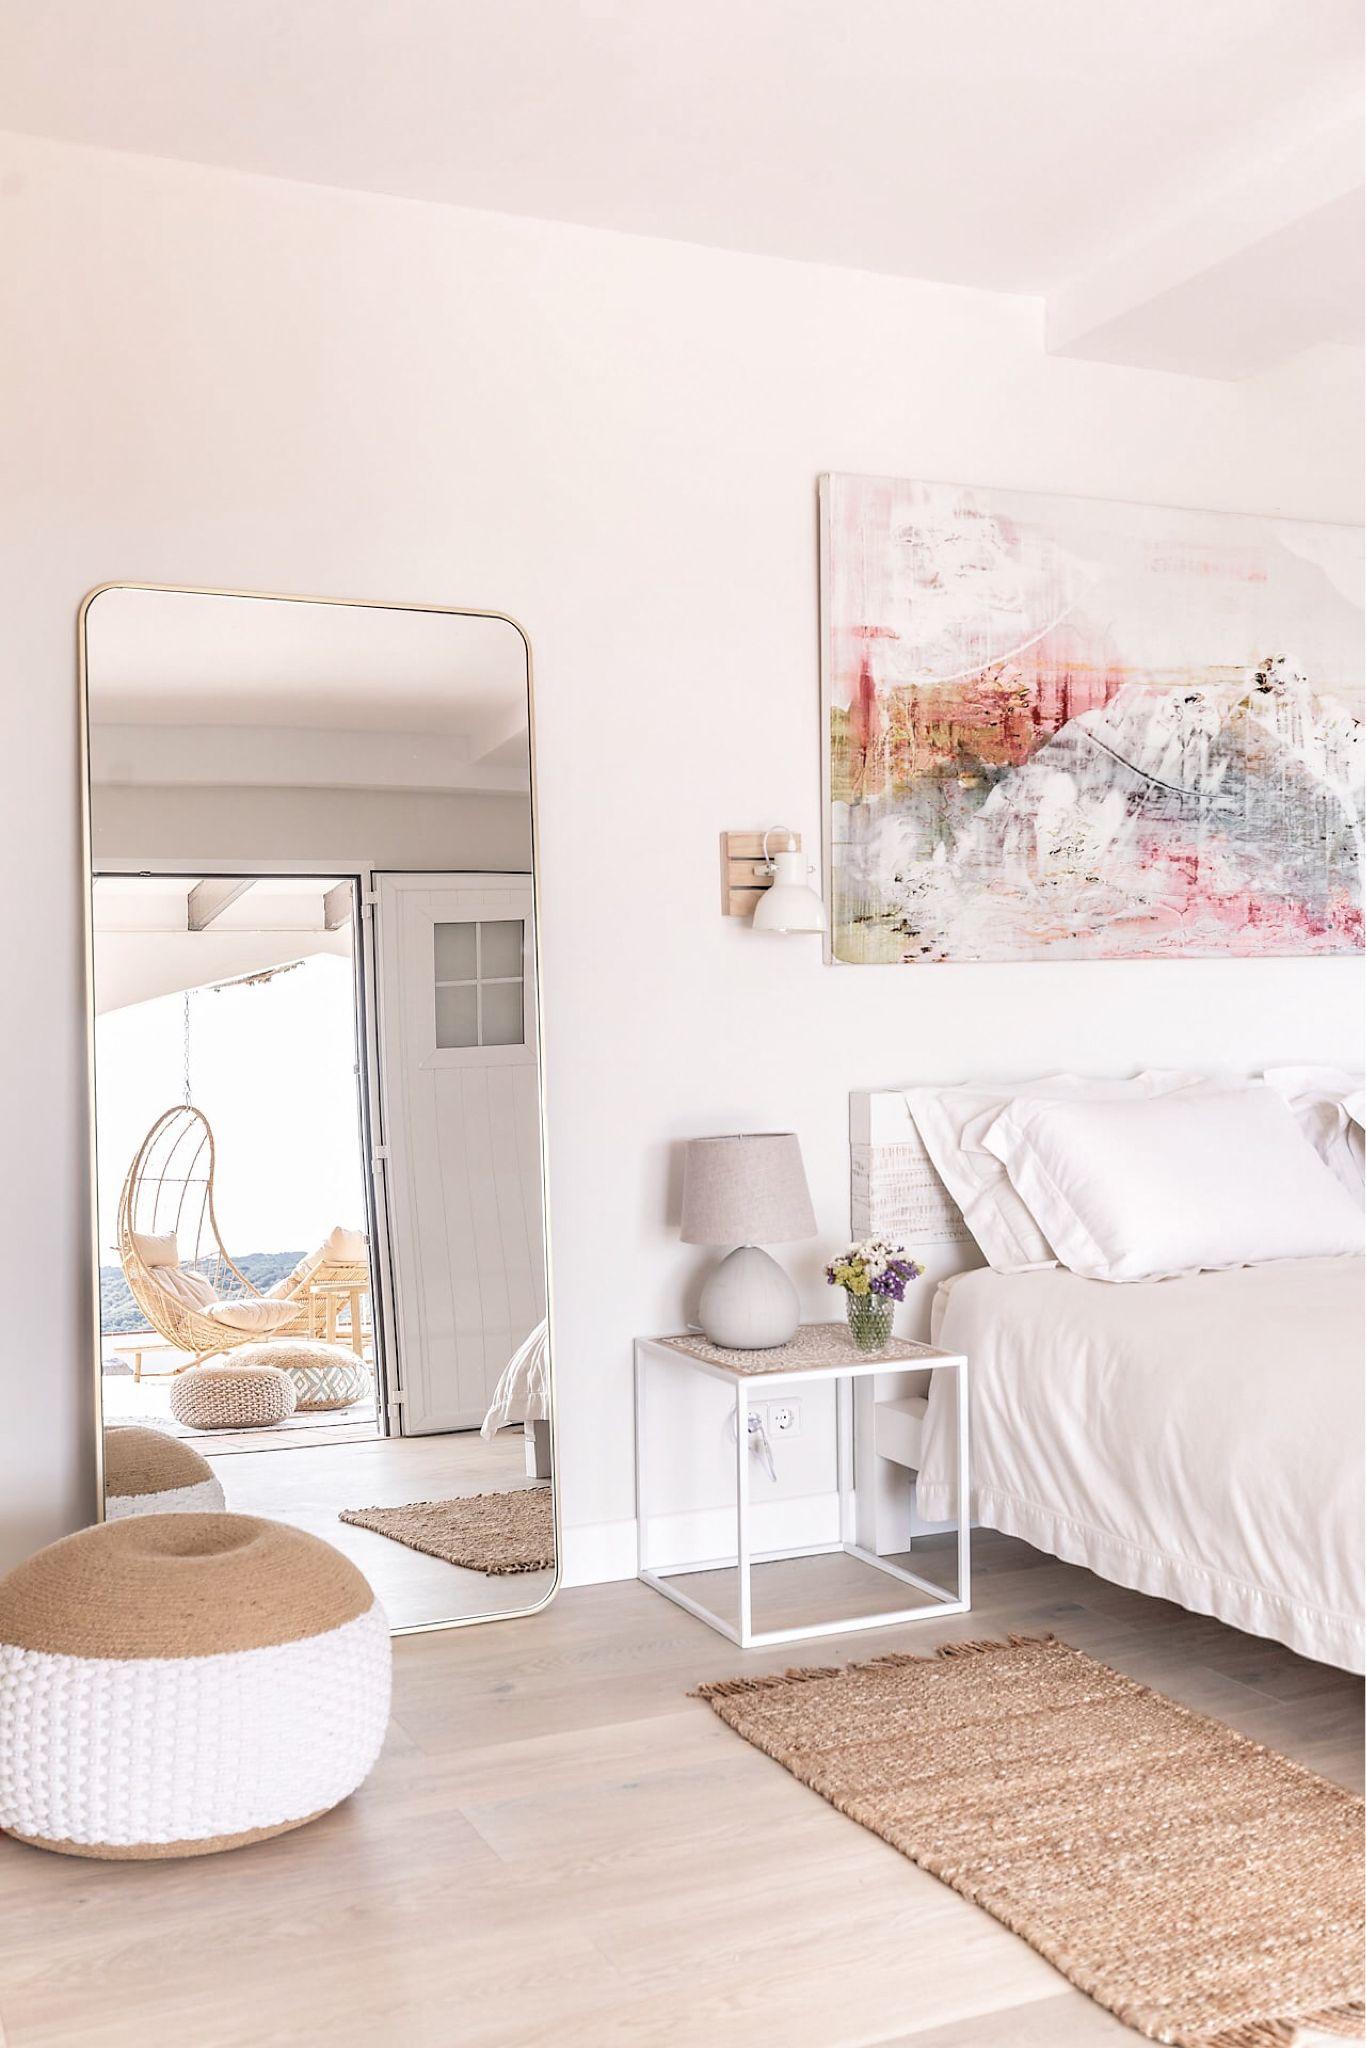 Neutral Bedroom Inspo Home Trends Bedroom Styles Bedroom Decor Bedroom design ideas app